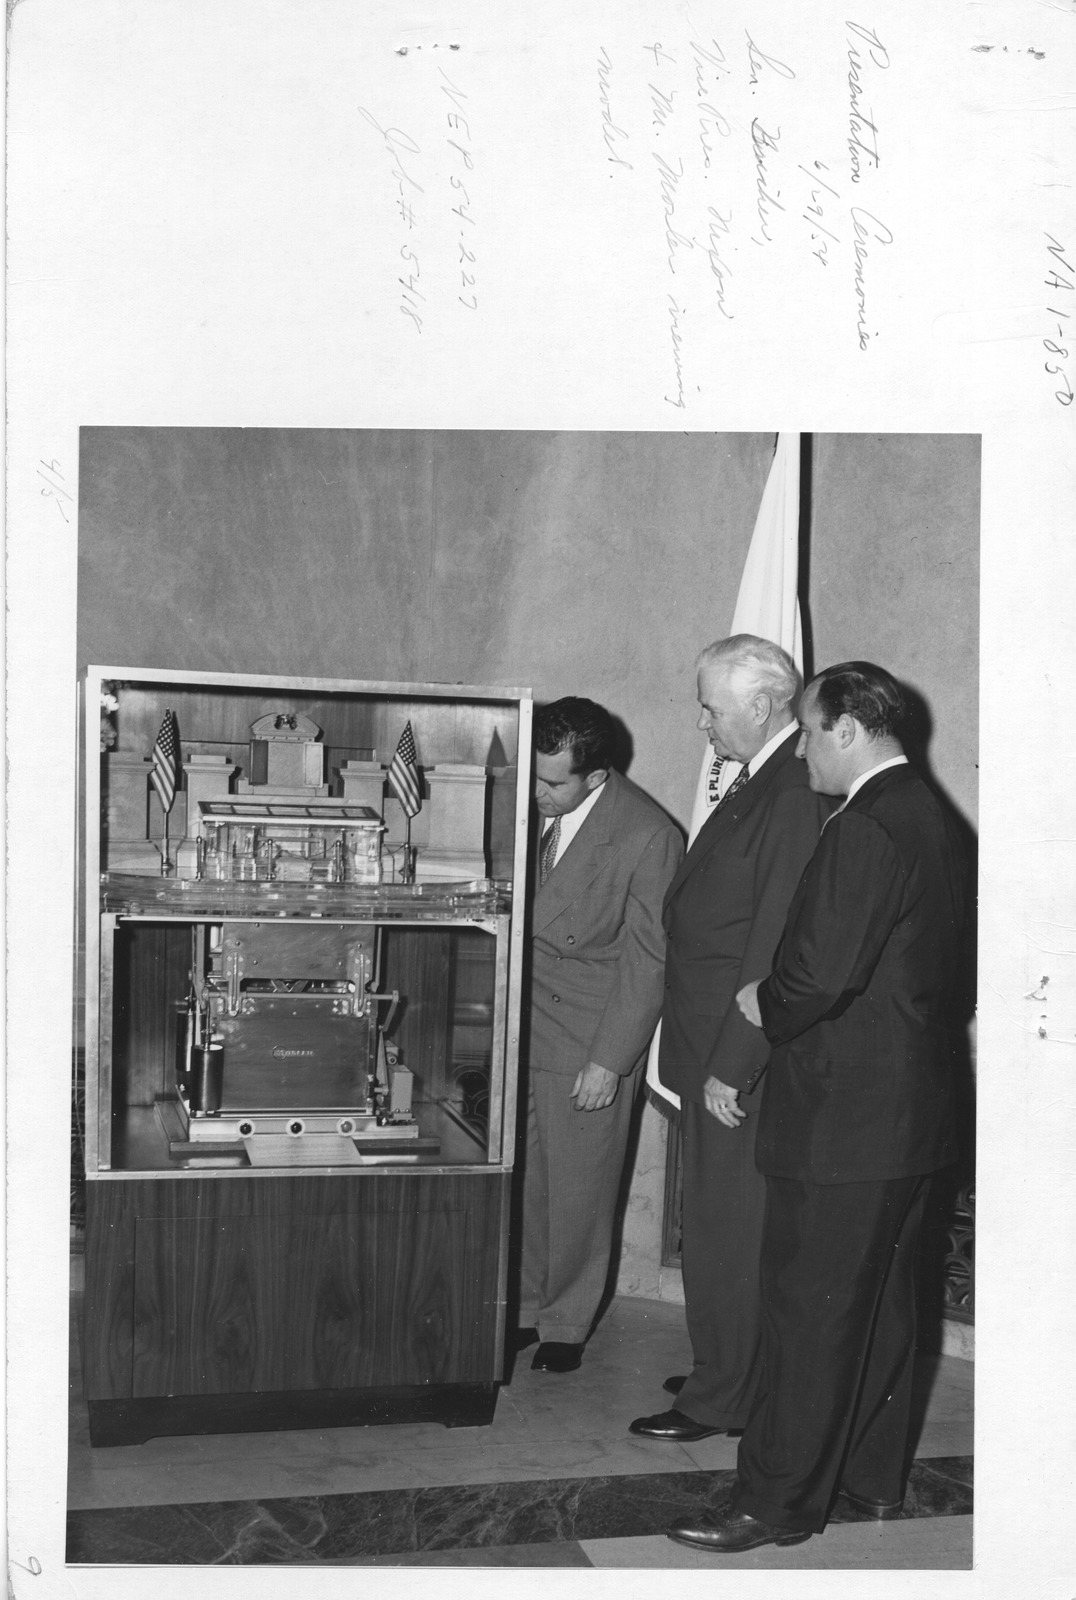 Photograph of Presentation Ceremonies, Mr. Mosler, Vice President Richard Nixon, Senator Bricker Viewing Model